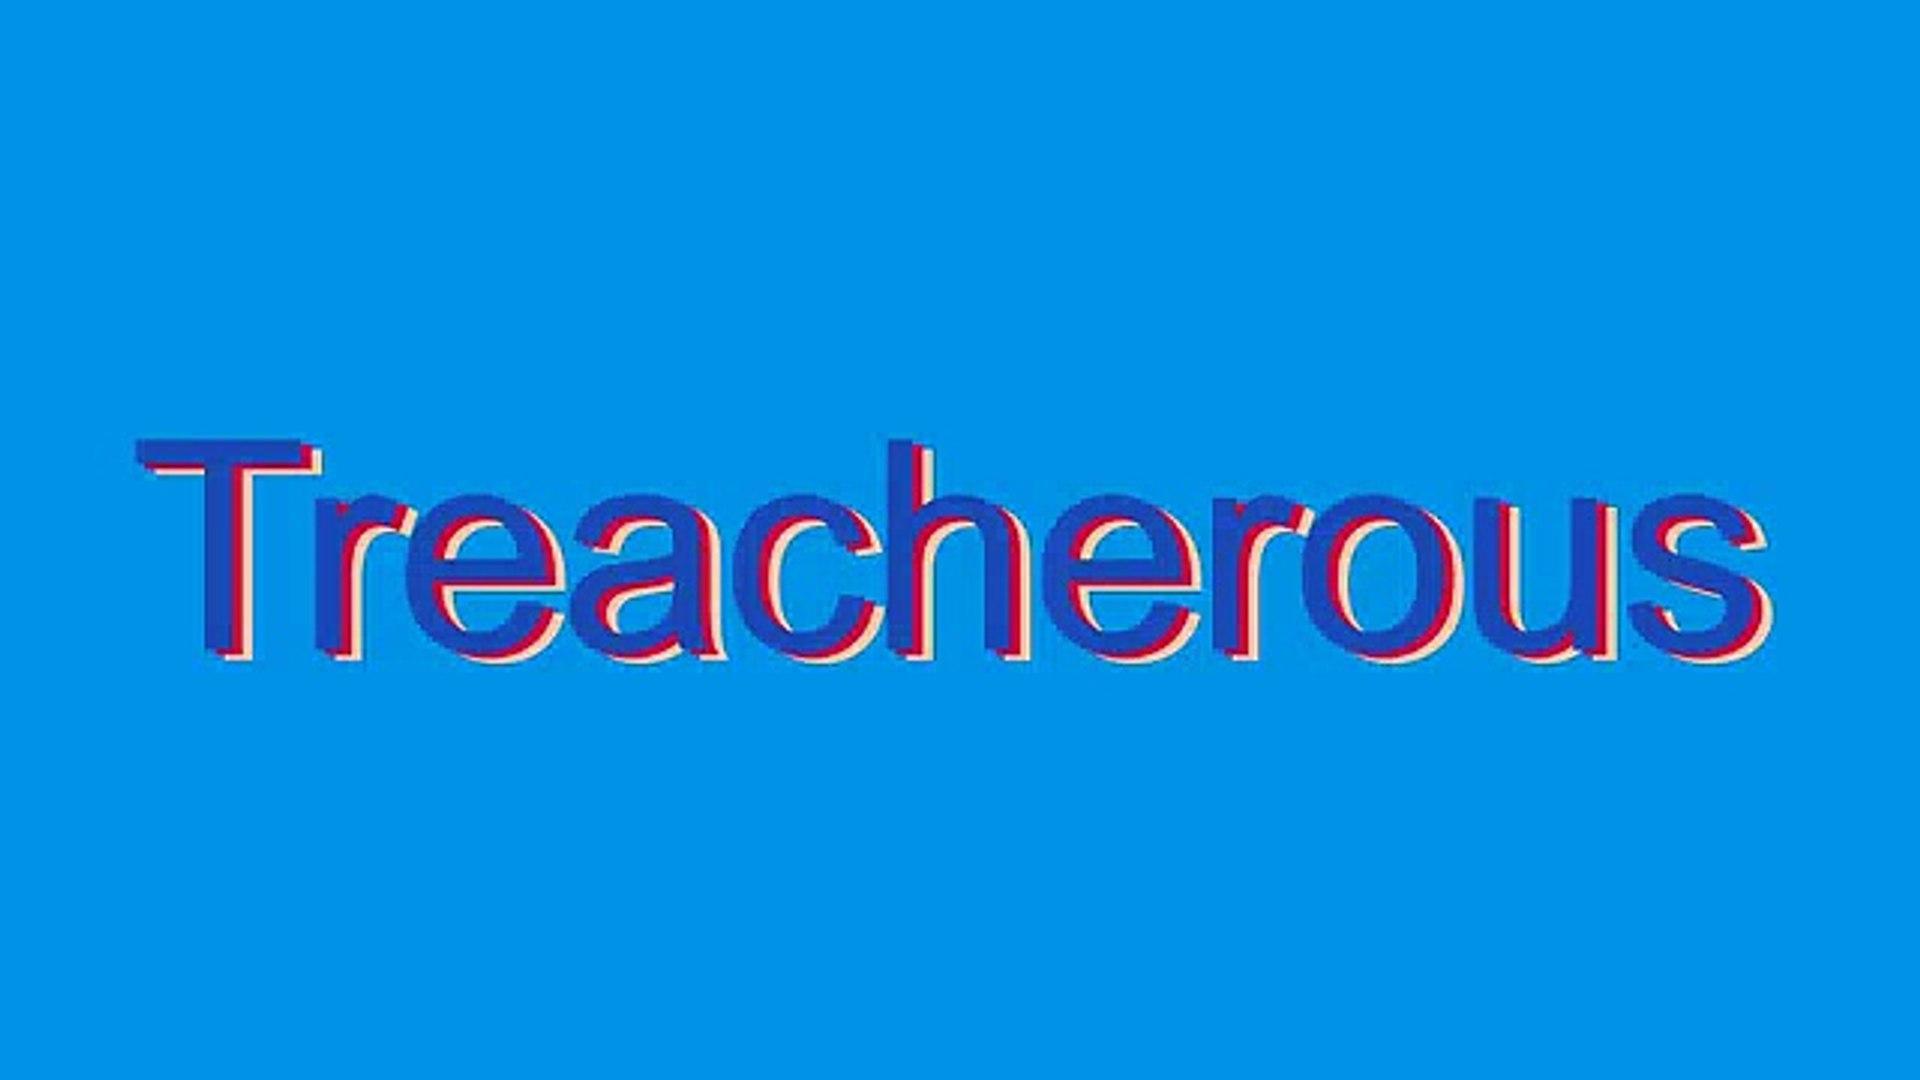 How to Pronounce Treacherous